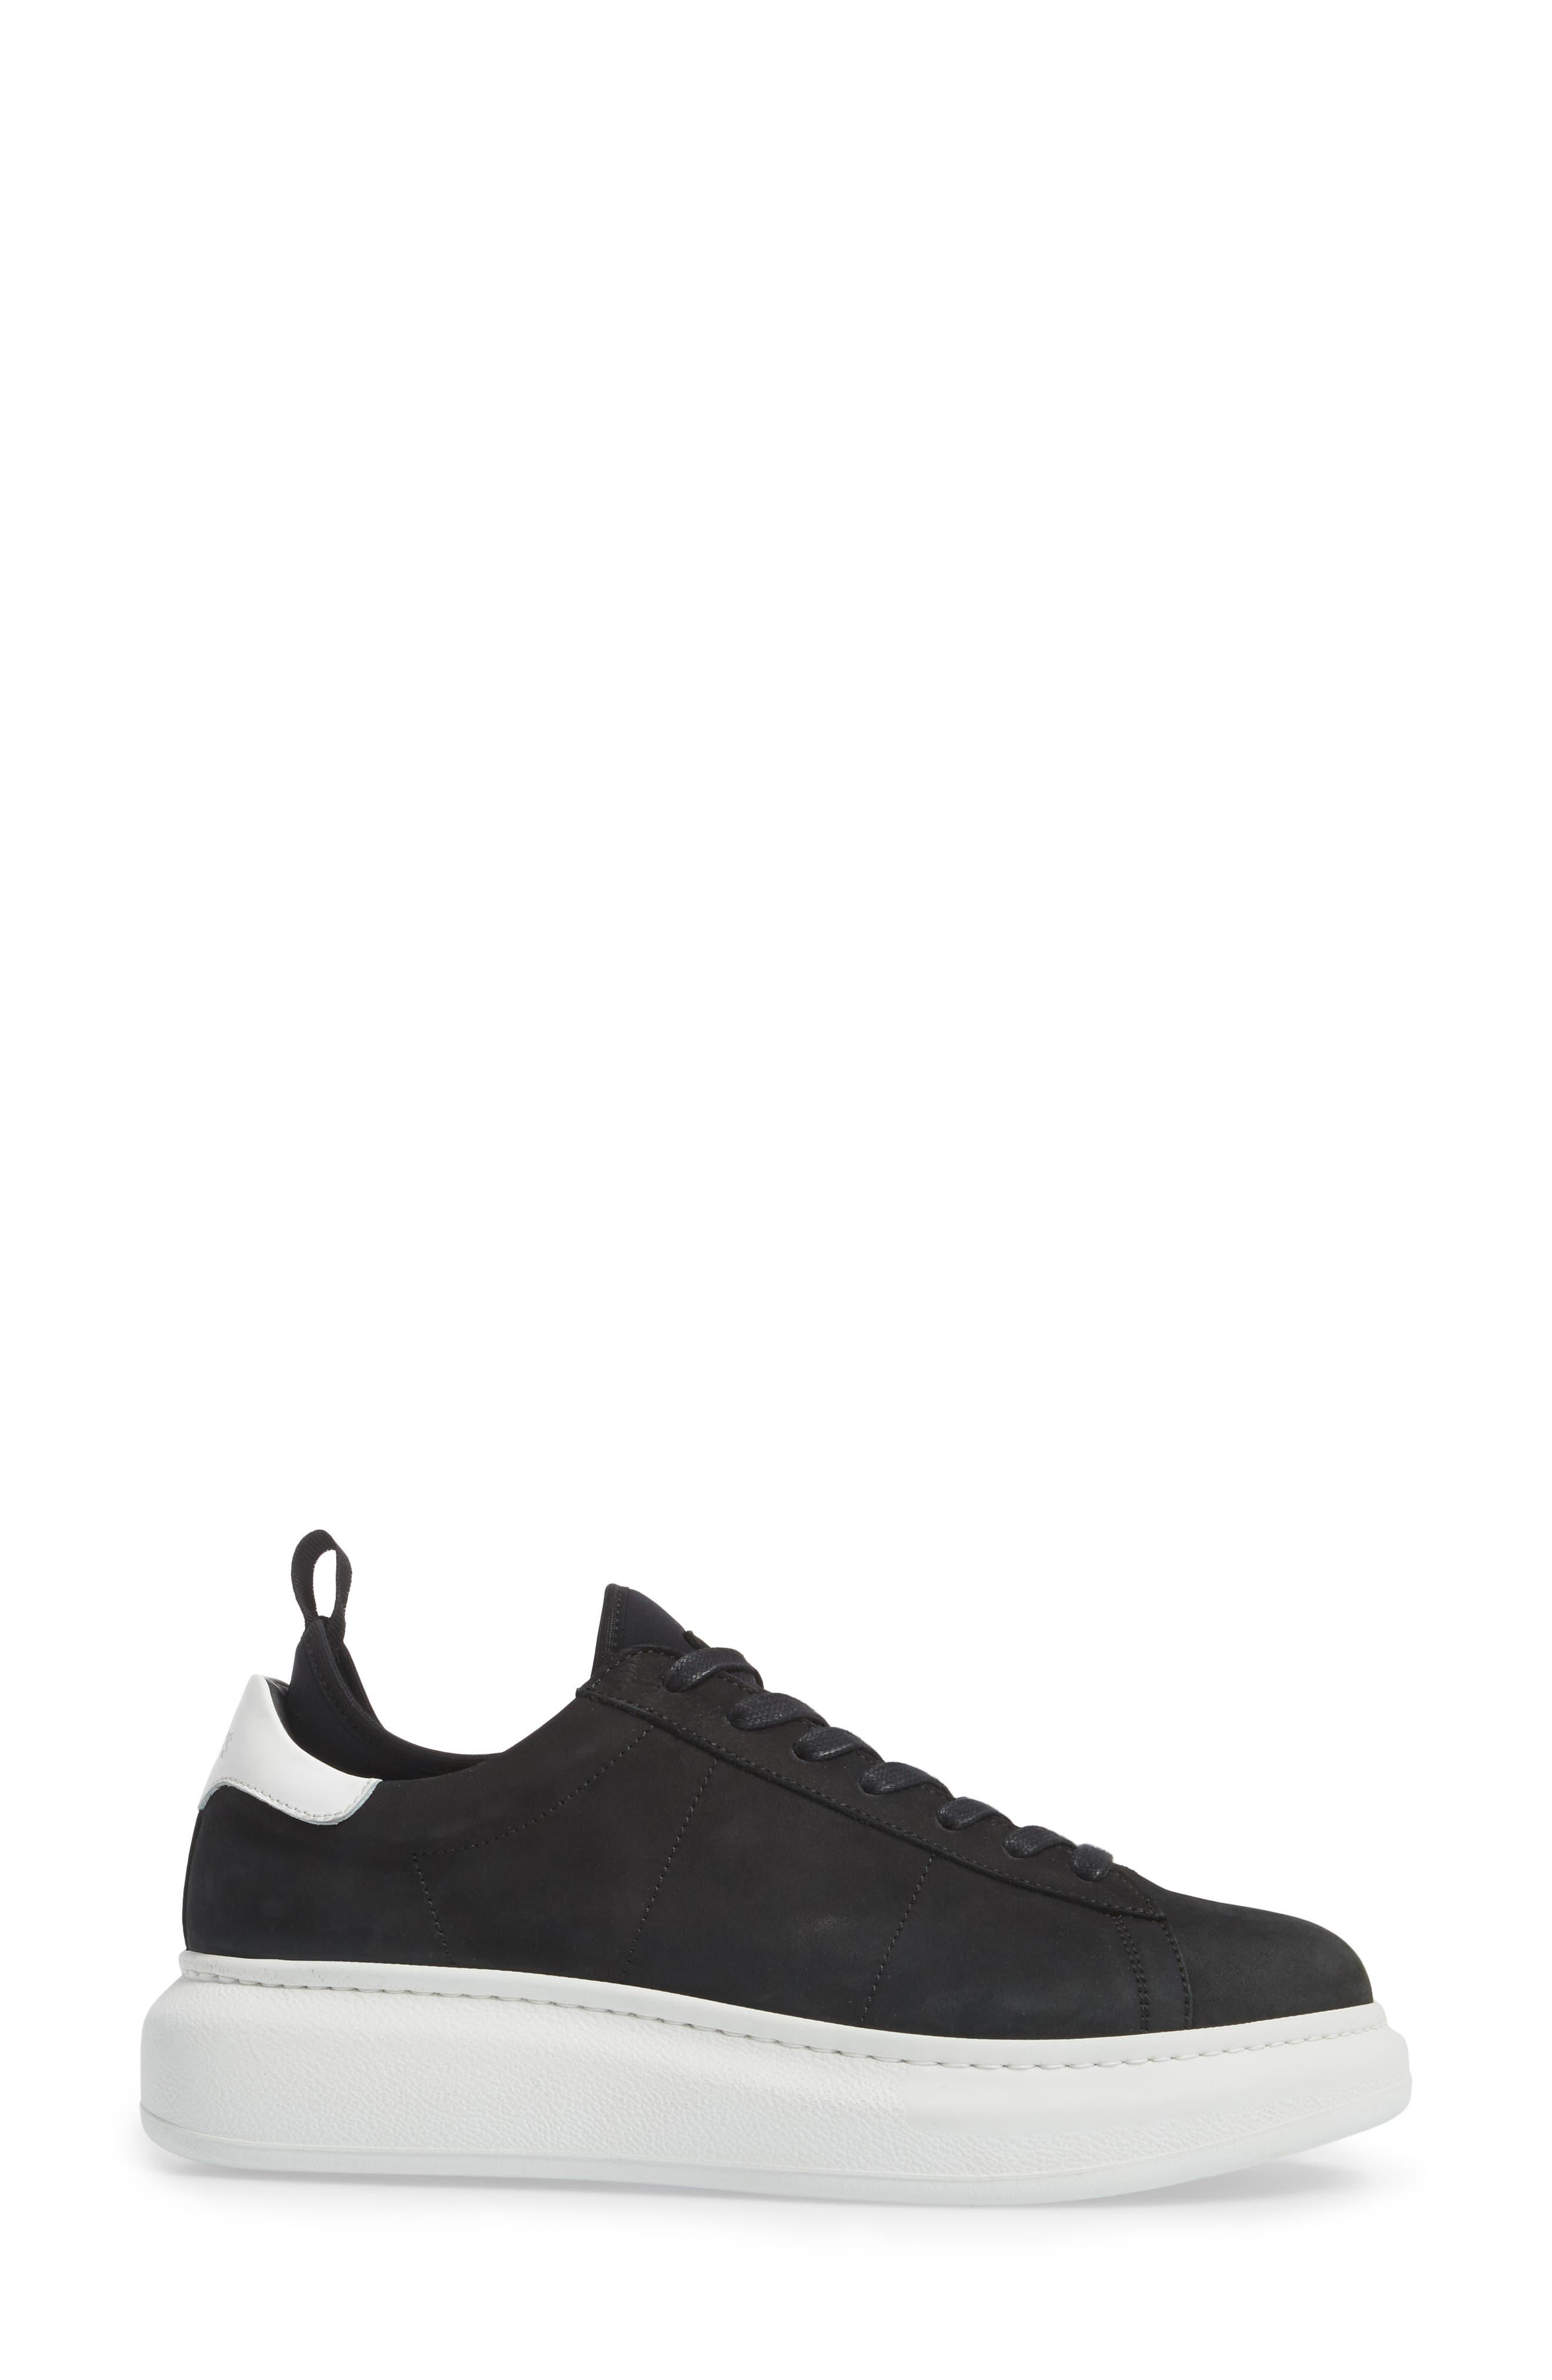 Alta Low Top Sneaker,                             Alternate thumbnail 3, color,                             BLACK NUBUCK LEATHER